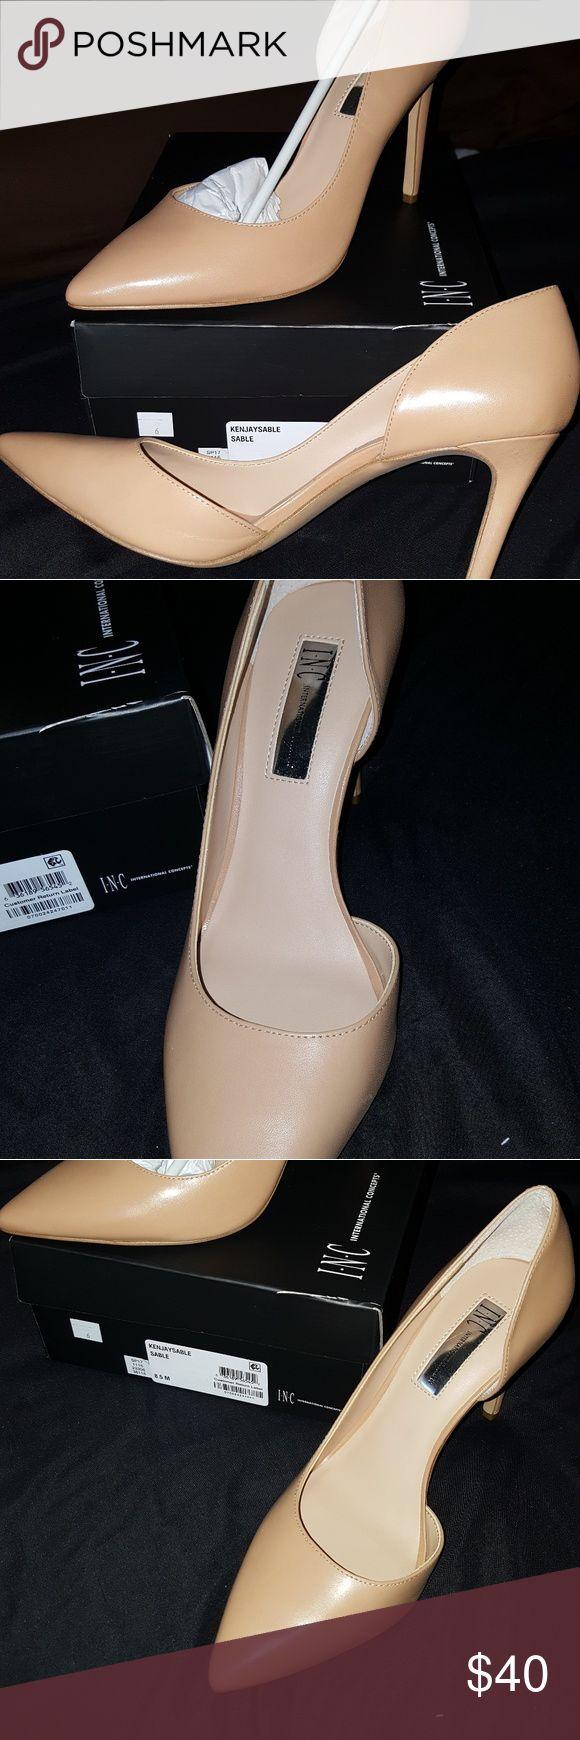 I.N.C High Heels High heels brand new never worn still in the box INC International Concepts Shoes Heels